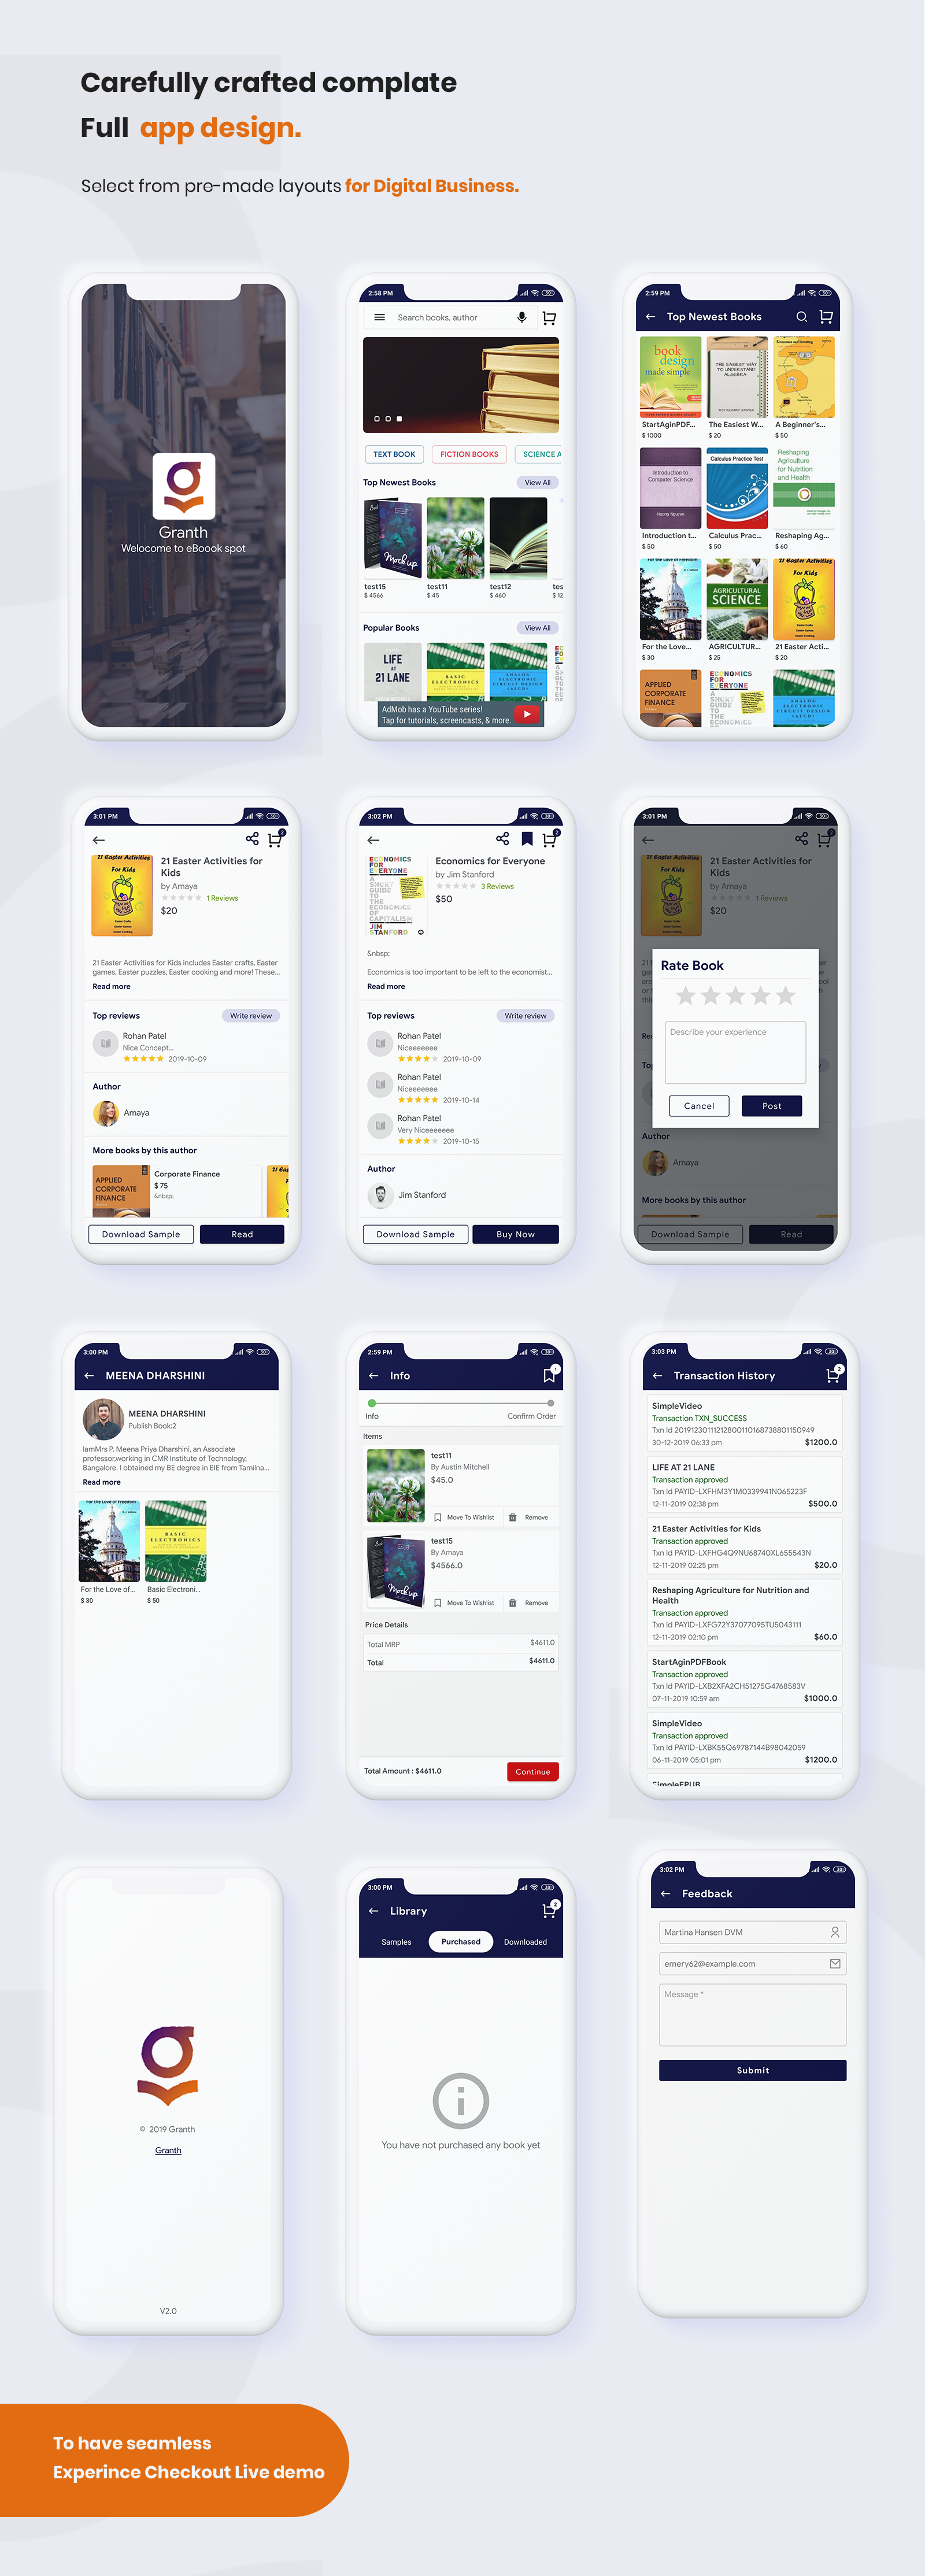 3 ios ebook app swift 4 + admin panel Granth 3 preview